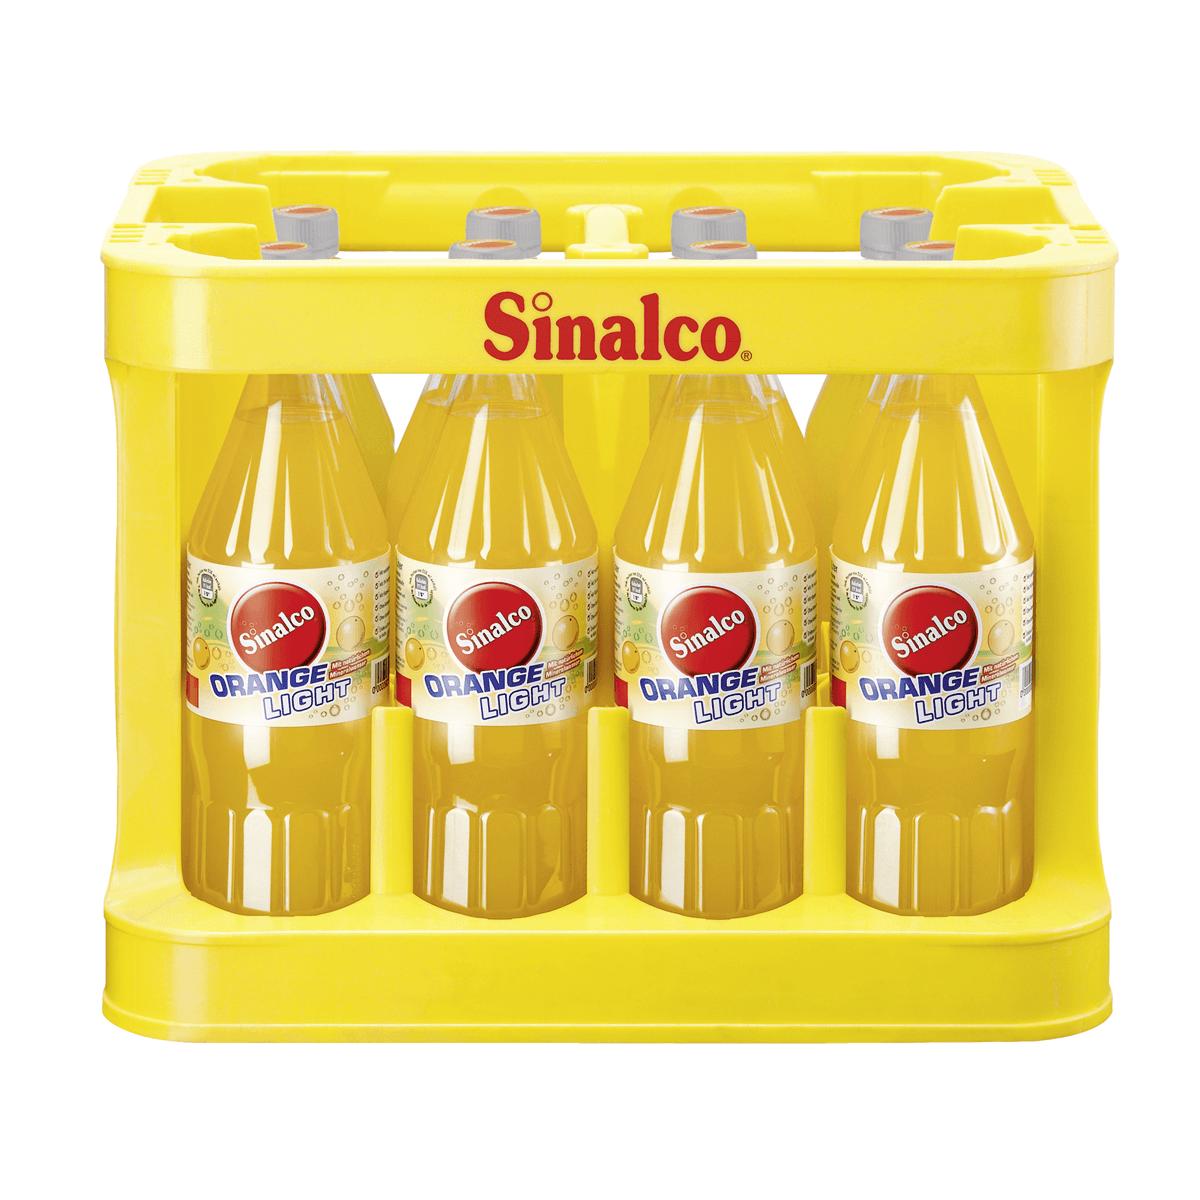 Sinalco Orange light 12 x 1L | Cola, Limonaden & Co | Alkoholfreie ...